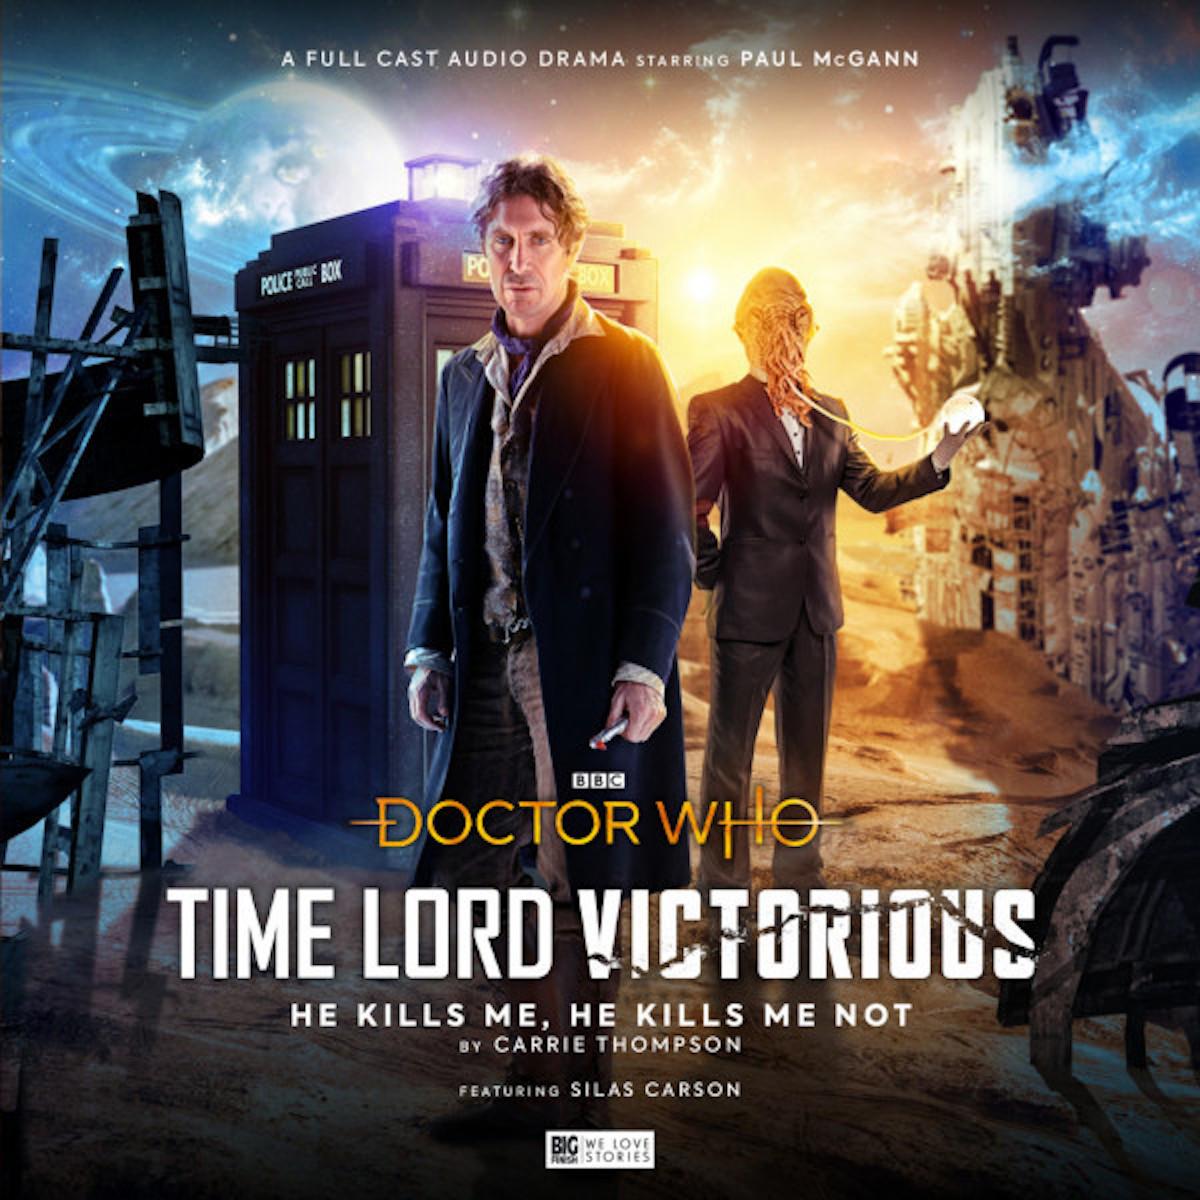 Time Lord Victorious: He Kills Me, He Kills Me Not